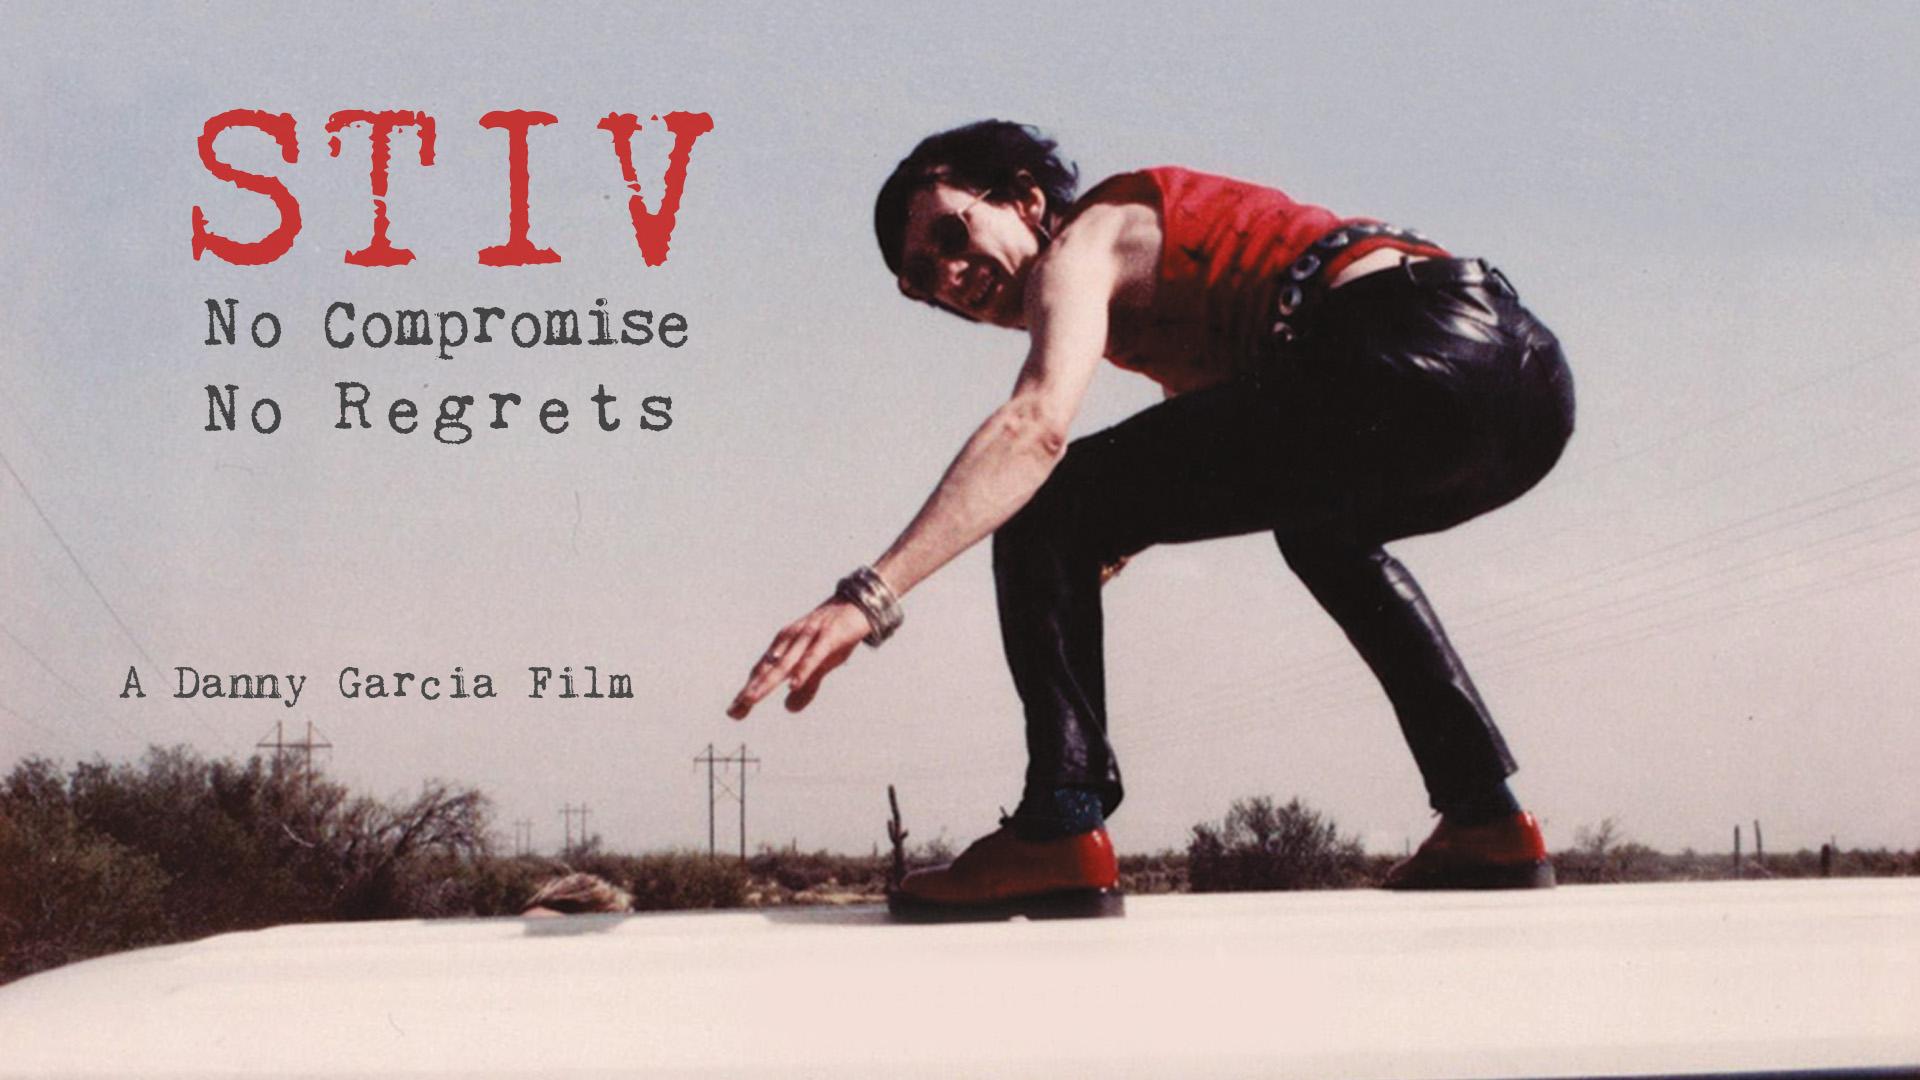 Stiv: No Compromise No Regrets